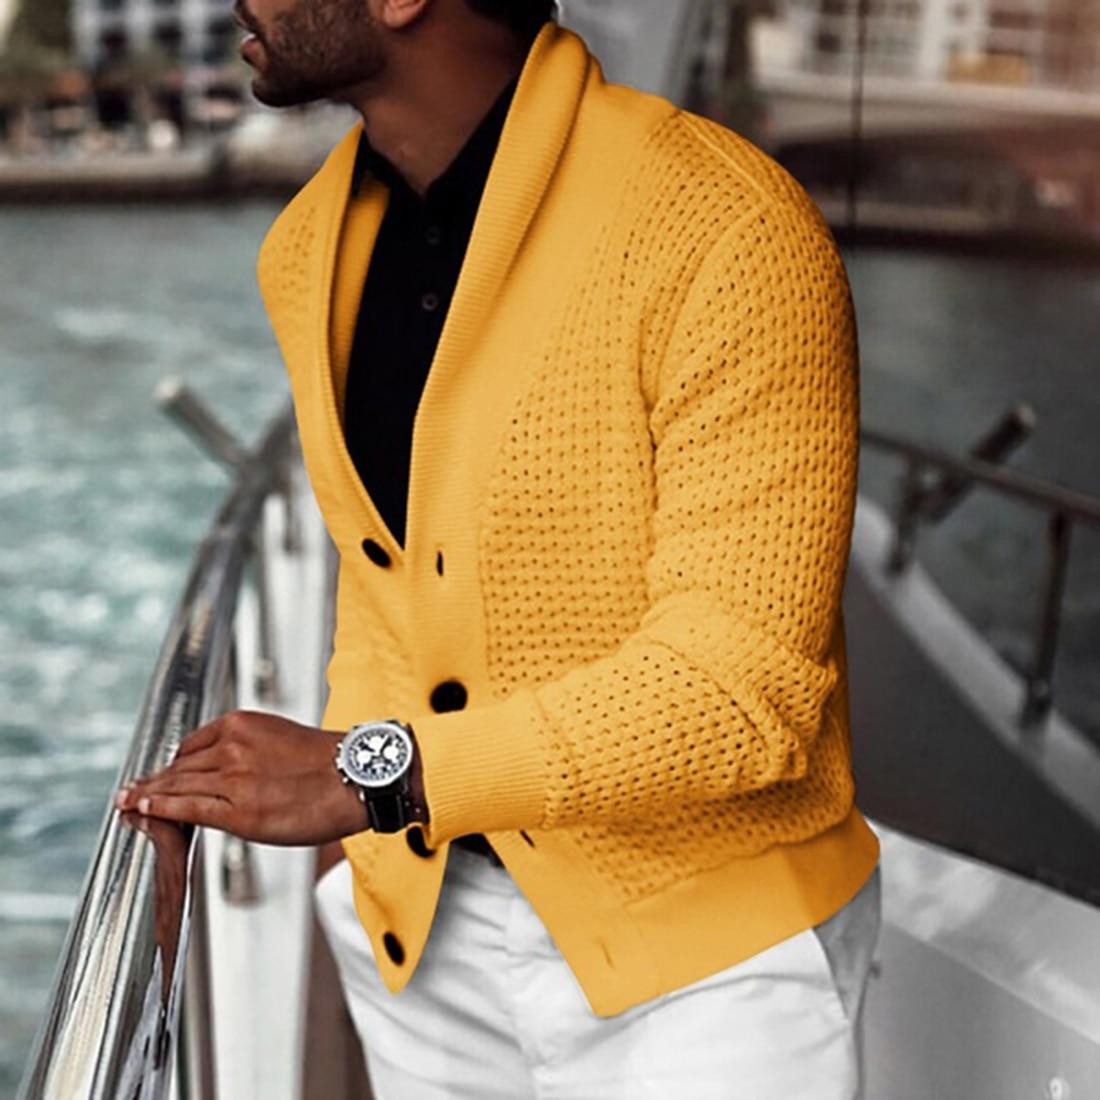 2020 Autumn Men Cardigan Sweater Coat Warm Knitting Sweaters Casual Slim Fit Turtleneck Jumpers Men Winter Business Sweater